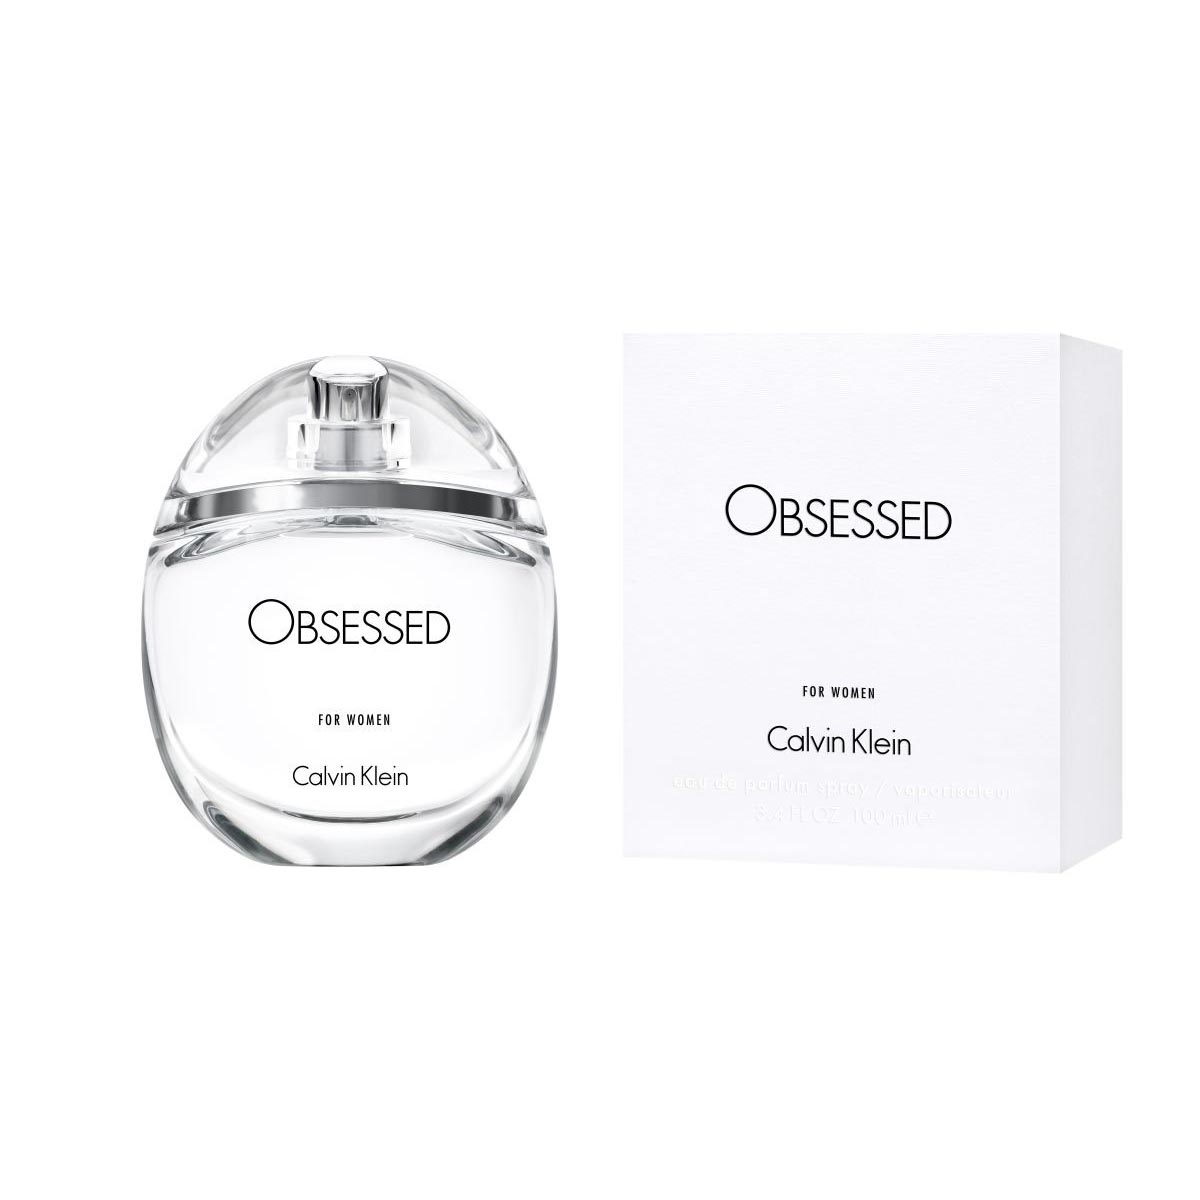 Calvin klein obsessed for women eau de parfum 100ml vaporizador